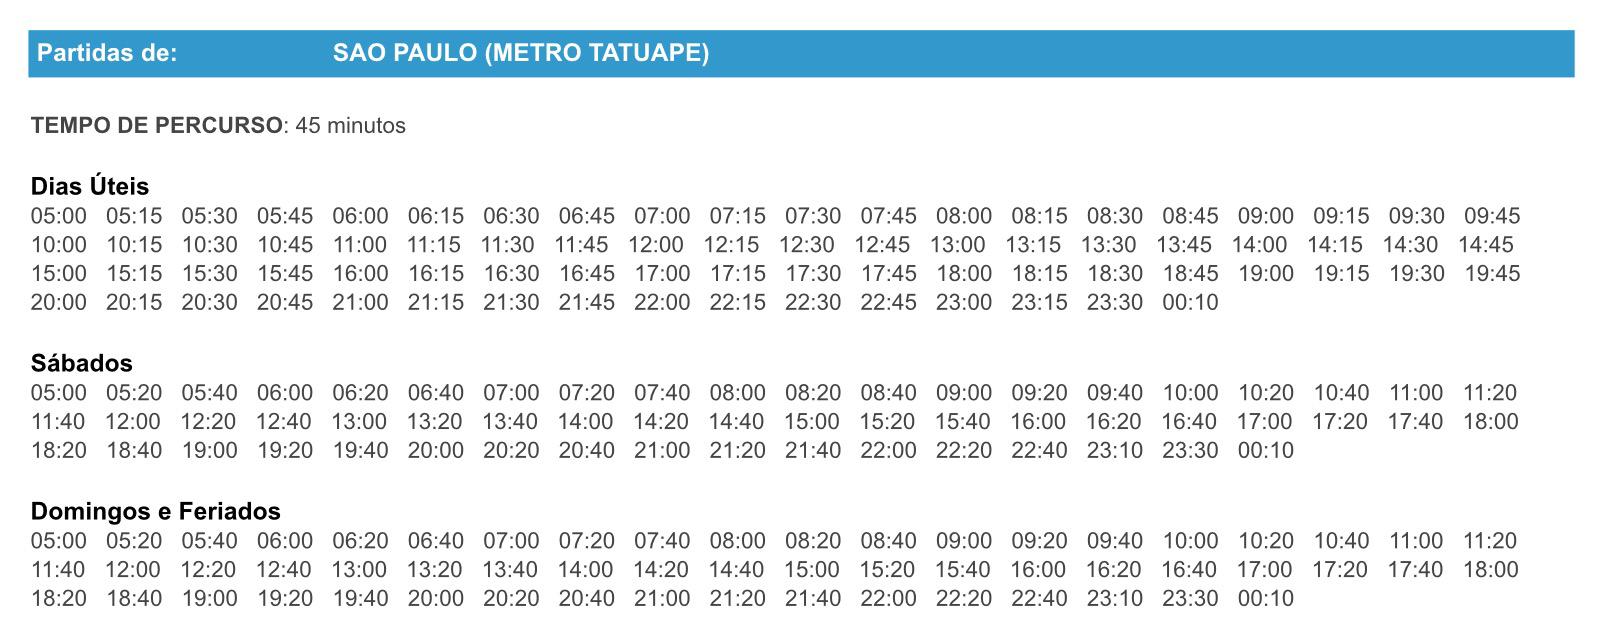 Como chegar ao aeroporto de Guarulhos?